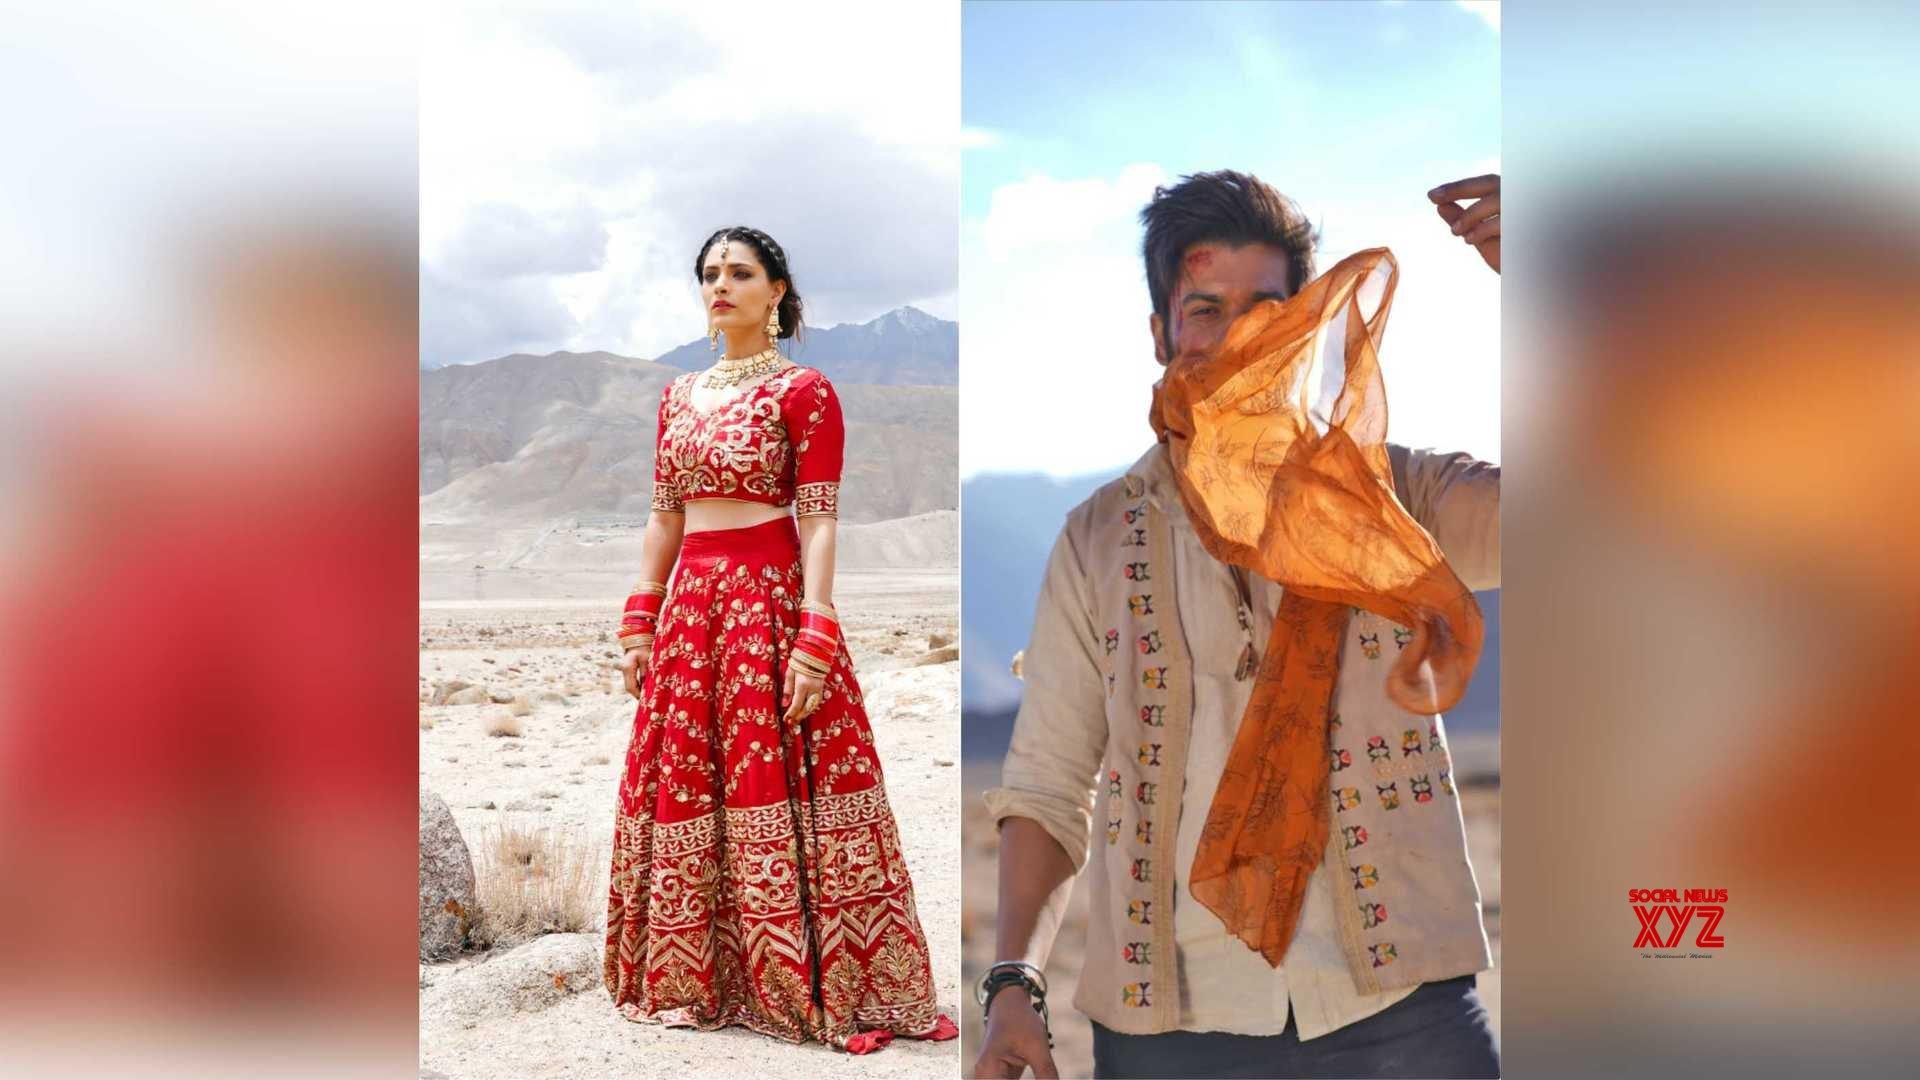 Sunny Kaushal & Saiyami Kher come together for the first time for Bhushan Kumar's 'Dil Lauta Do' sung by Jubin Nautiyal and Payal Dev